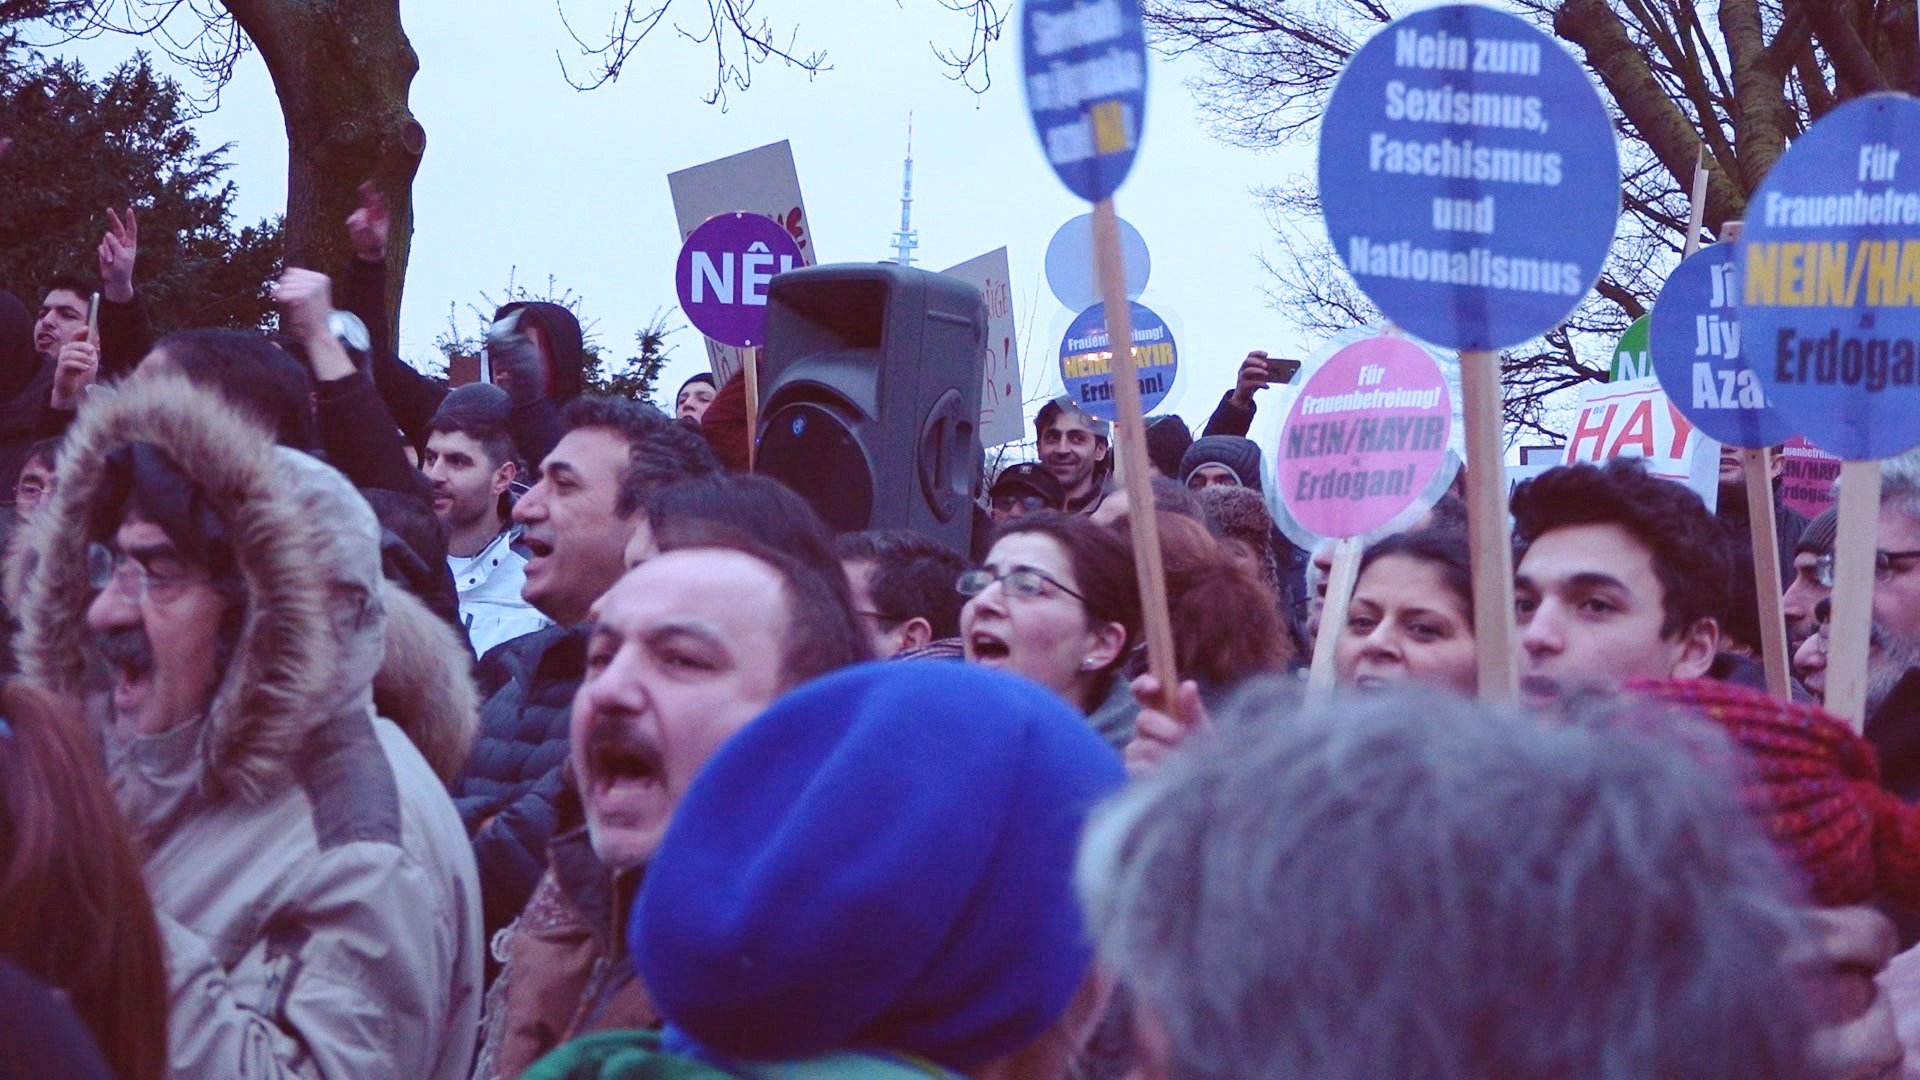 """Faschist Erdogan"" - Lautstarke Proteste gegen Wahlkampfauftritt"